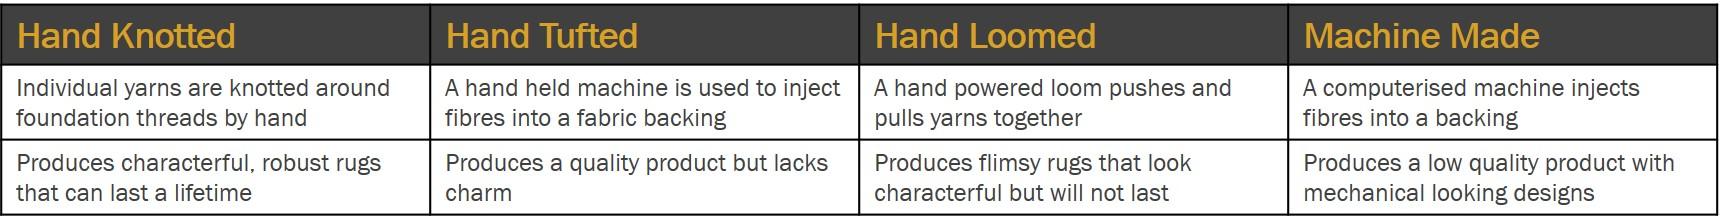 rug qualities comparison chart